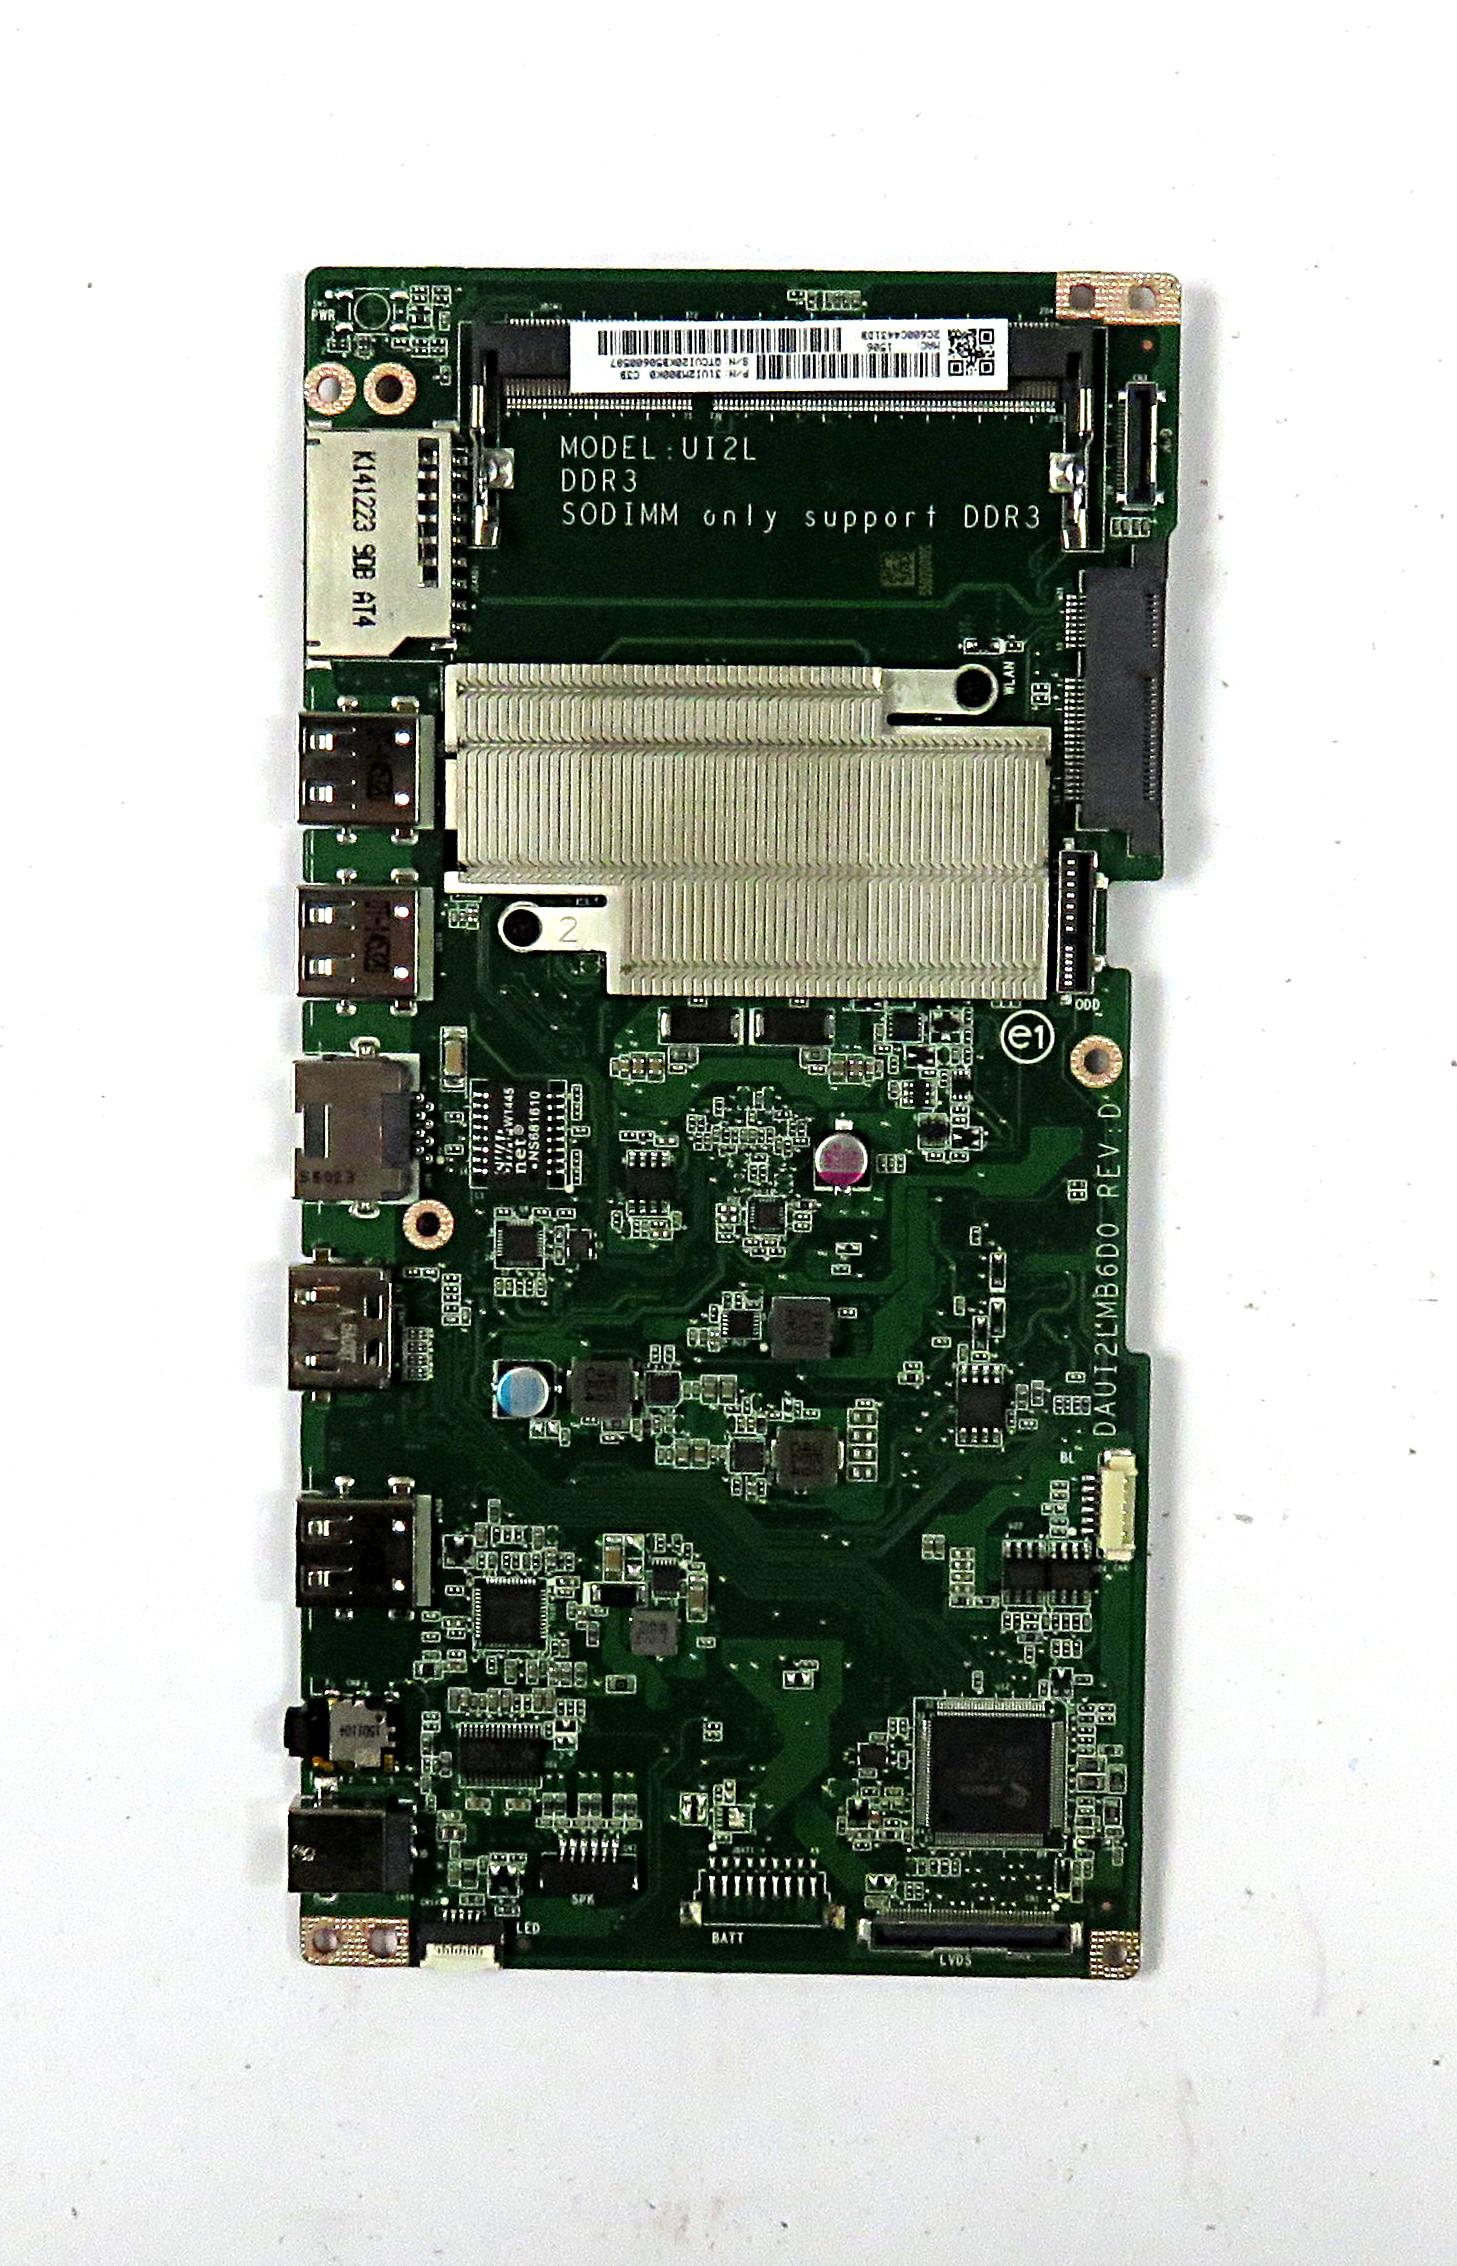 Acer DB.SYH11.002 Motherboard  Model:UI2L f/ Aspire Z1-621 w/ N3540 CPU